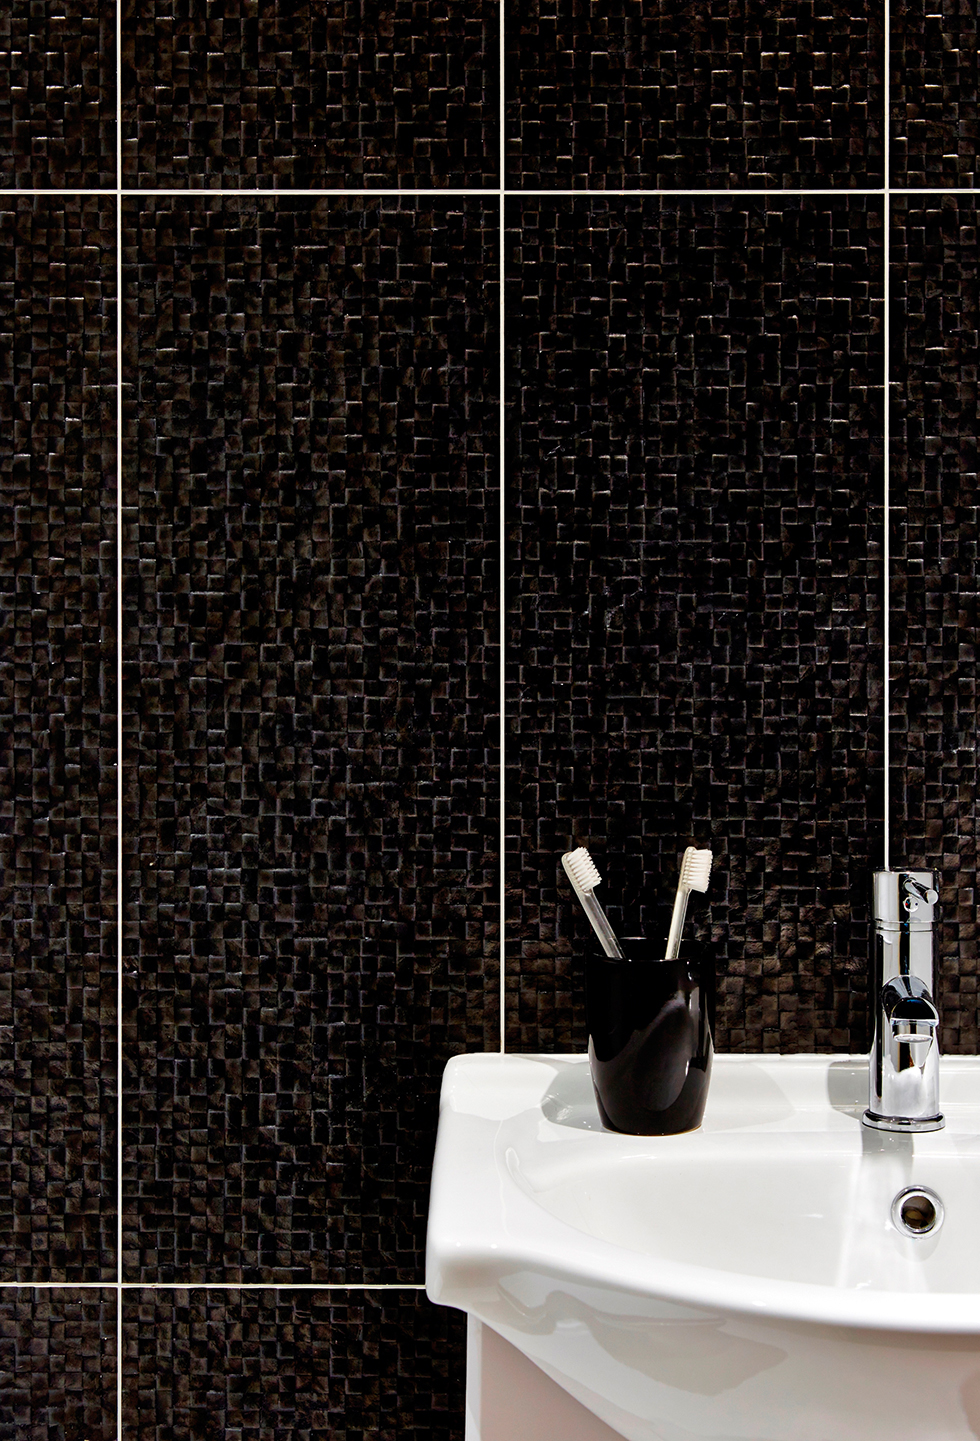 Perla black satin mosaic ceramic wall tiles from Tile Mountain